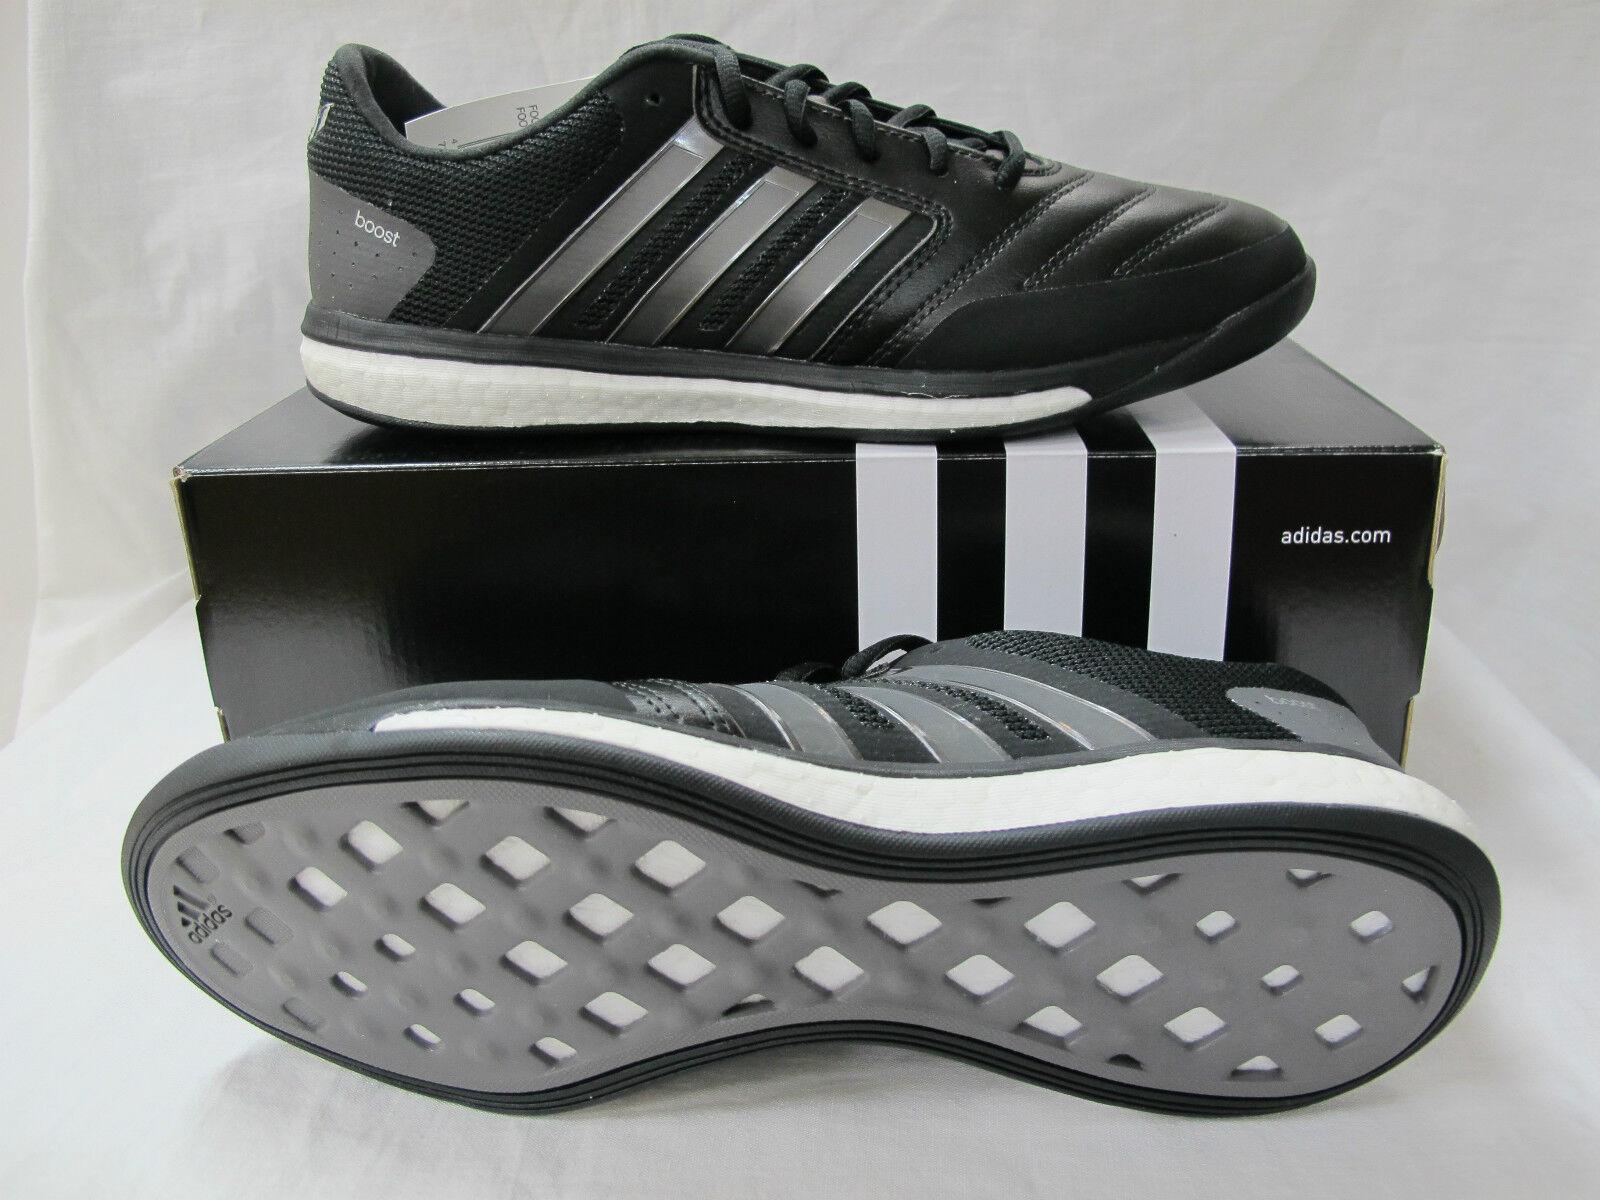 Adidas Zapatos Fútbol Sala Interior Mod.ff Boost de Messi